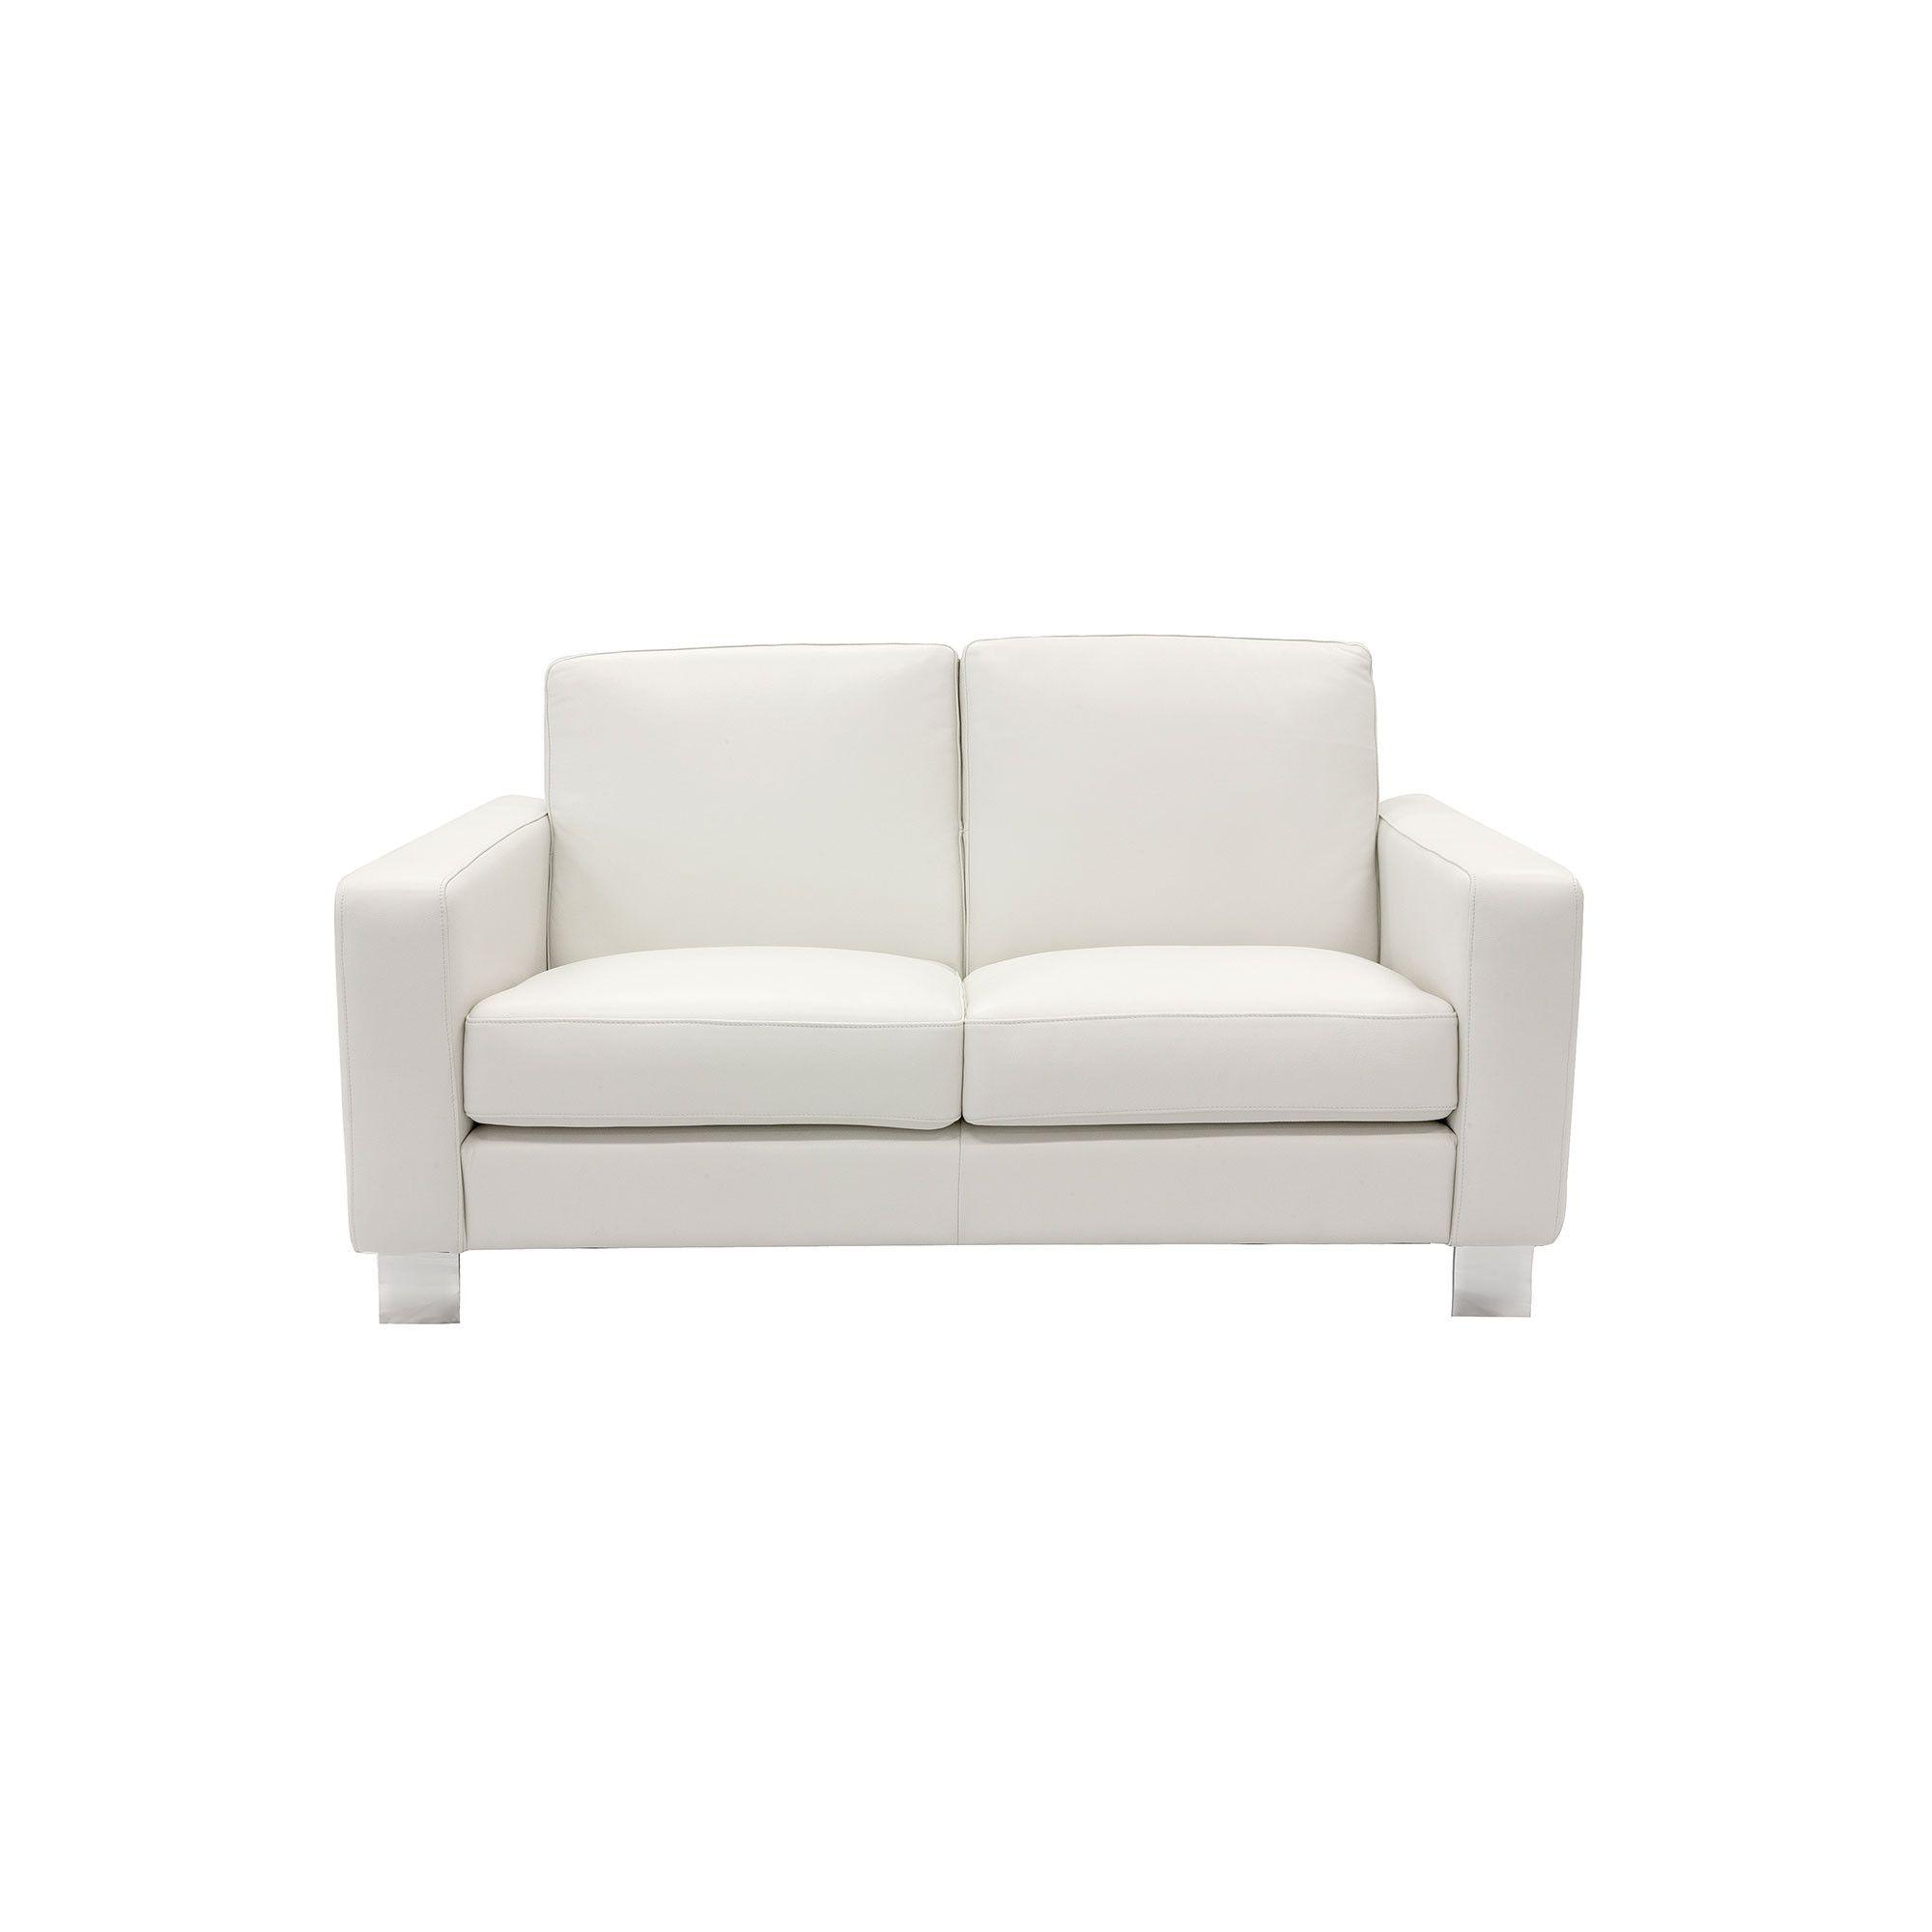 Bemerkenswert Sofa L Form Dengan Gambar